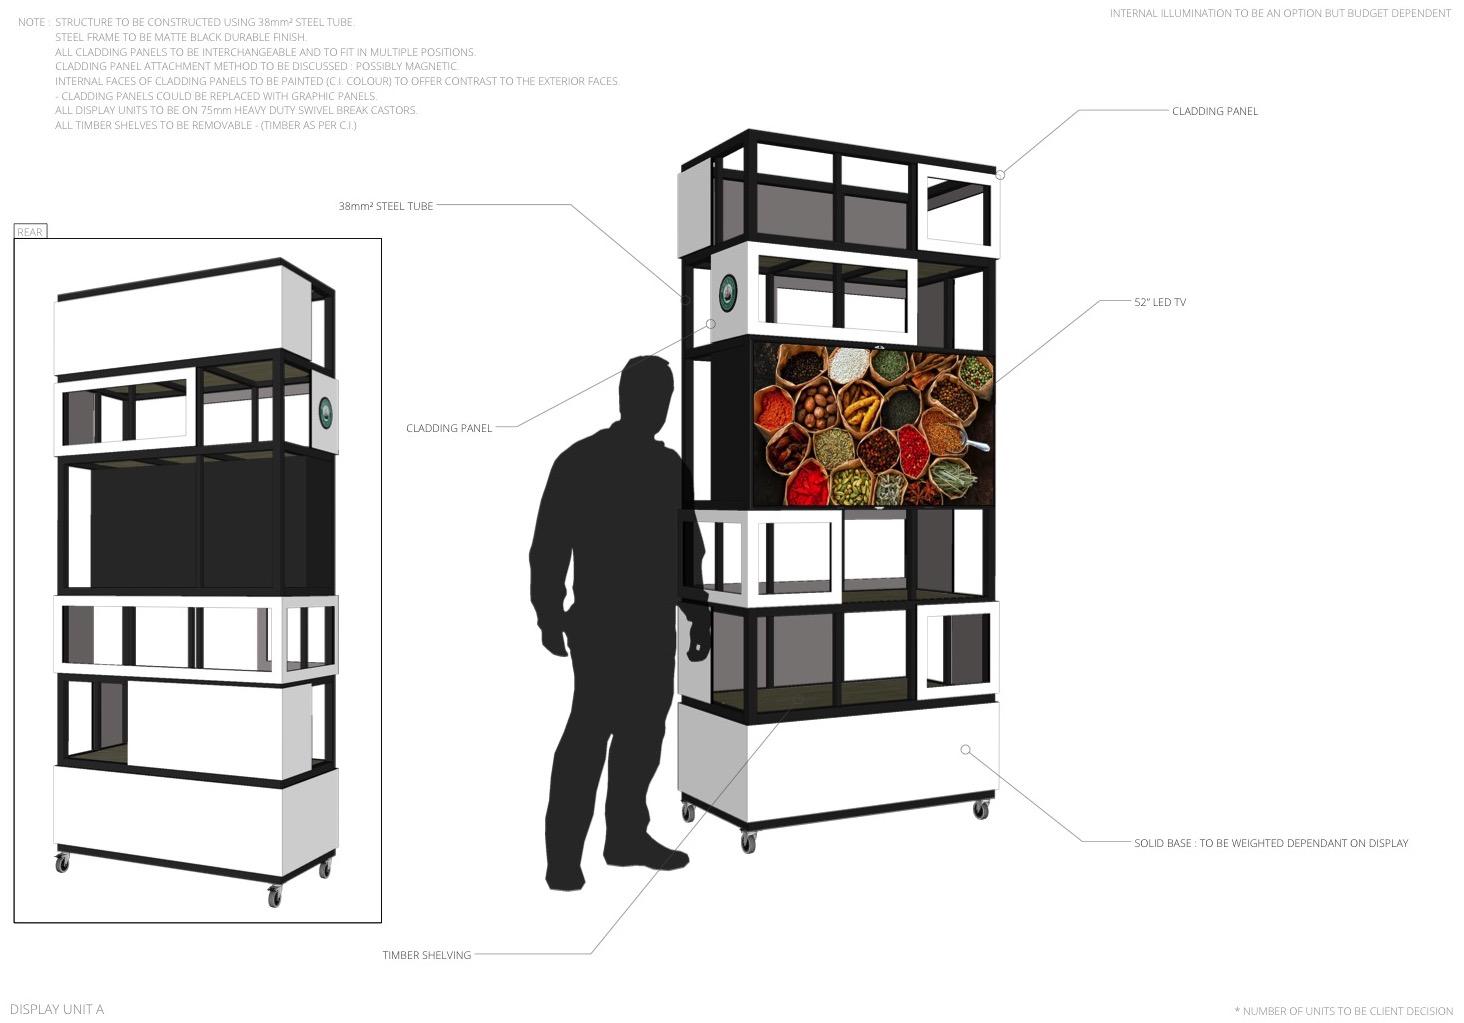 RDM2017 Layout&Design Proposal 24 June 2017_4.jpg